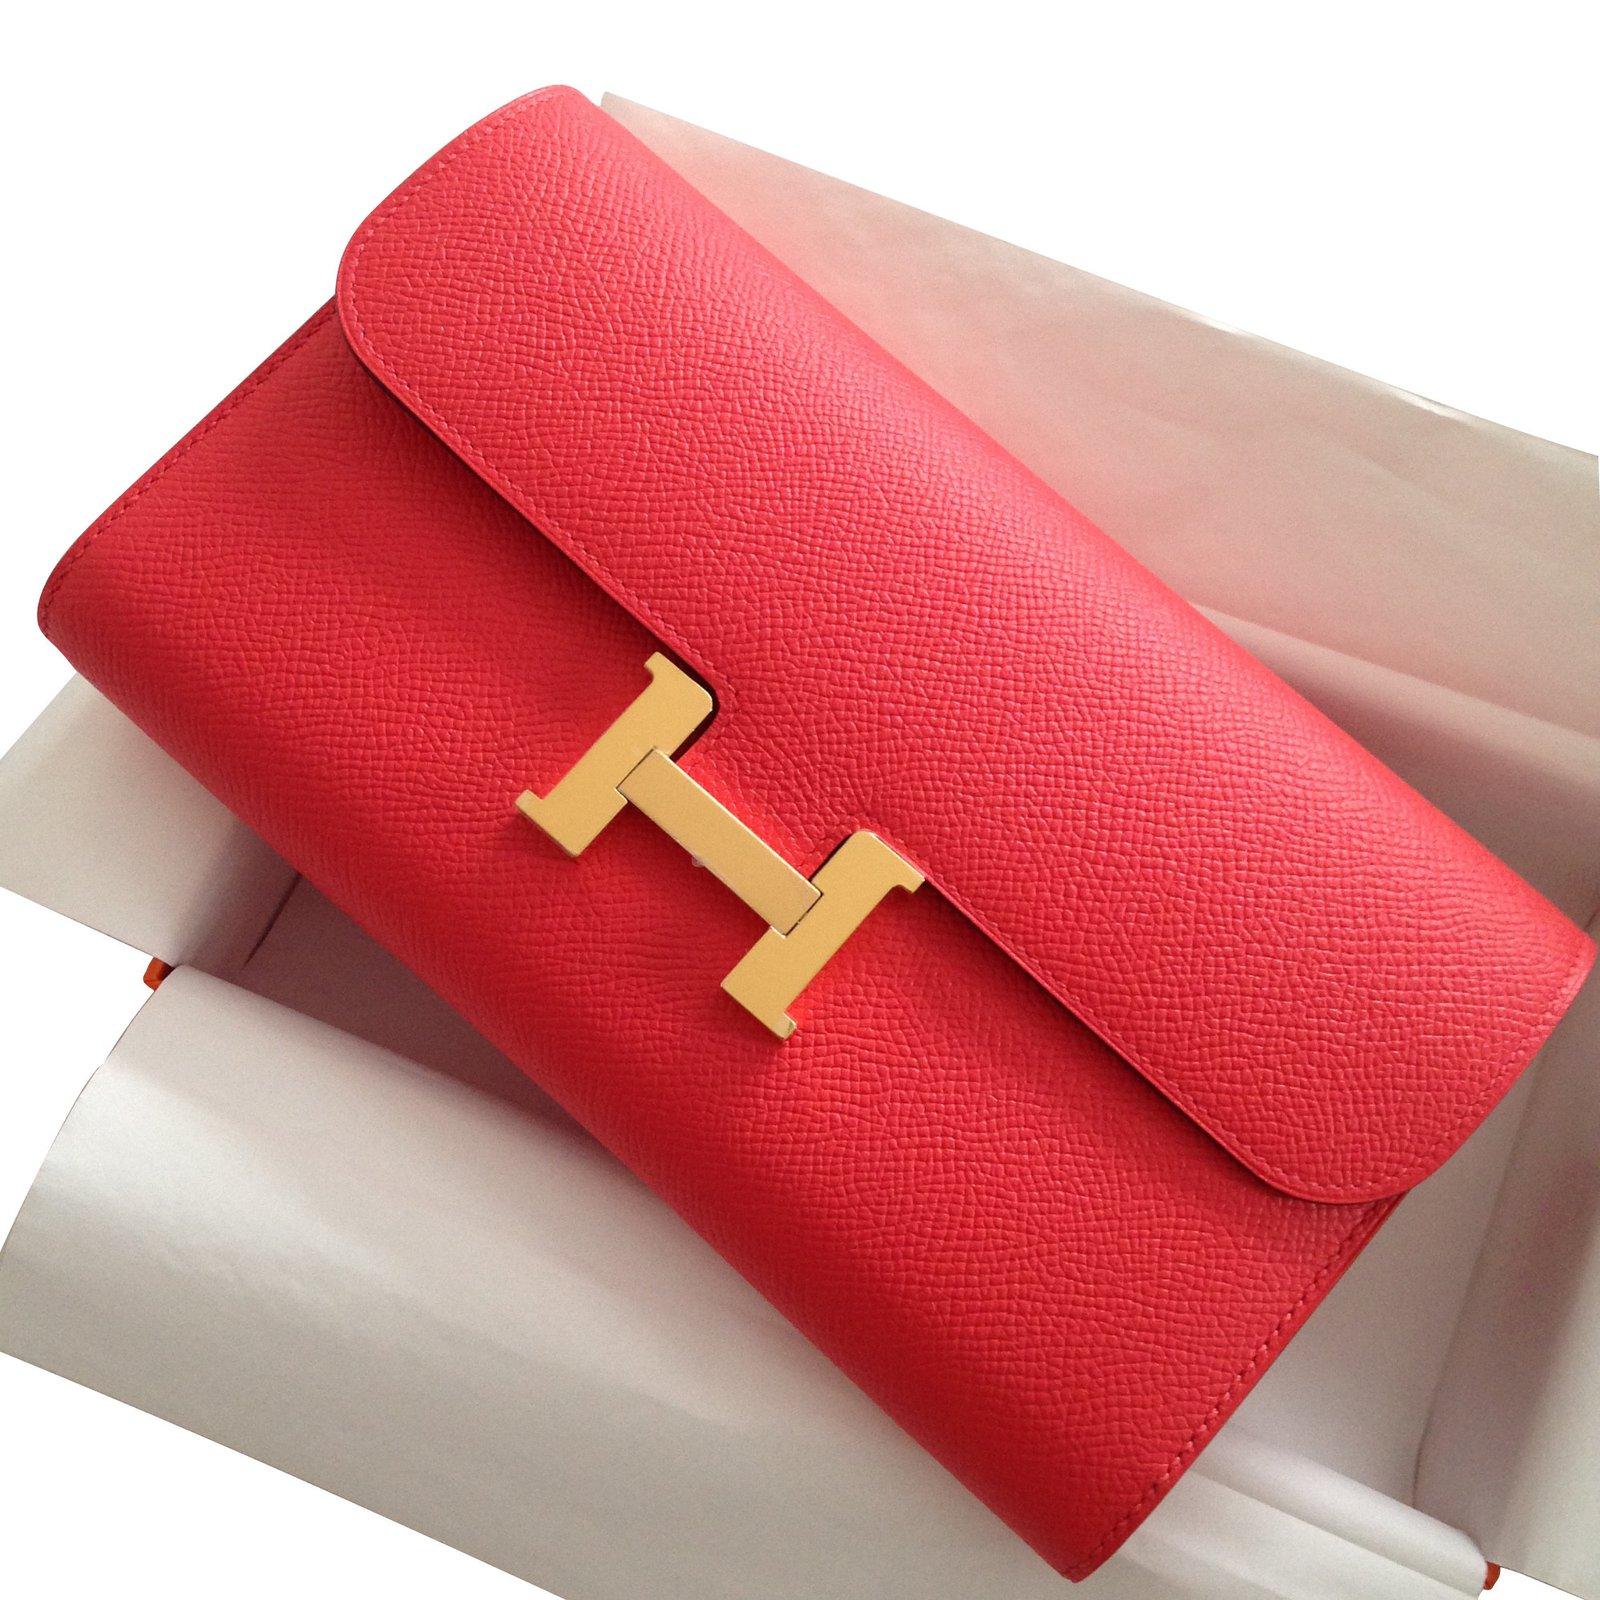 da2fedc883 Portefeuilles Hermès Constance clutch wallet Cuir Rose ref.16037 - Joli  Closet